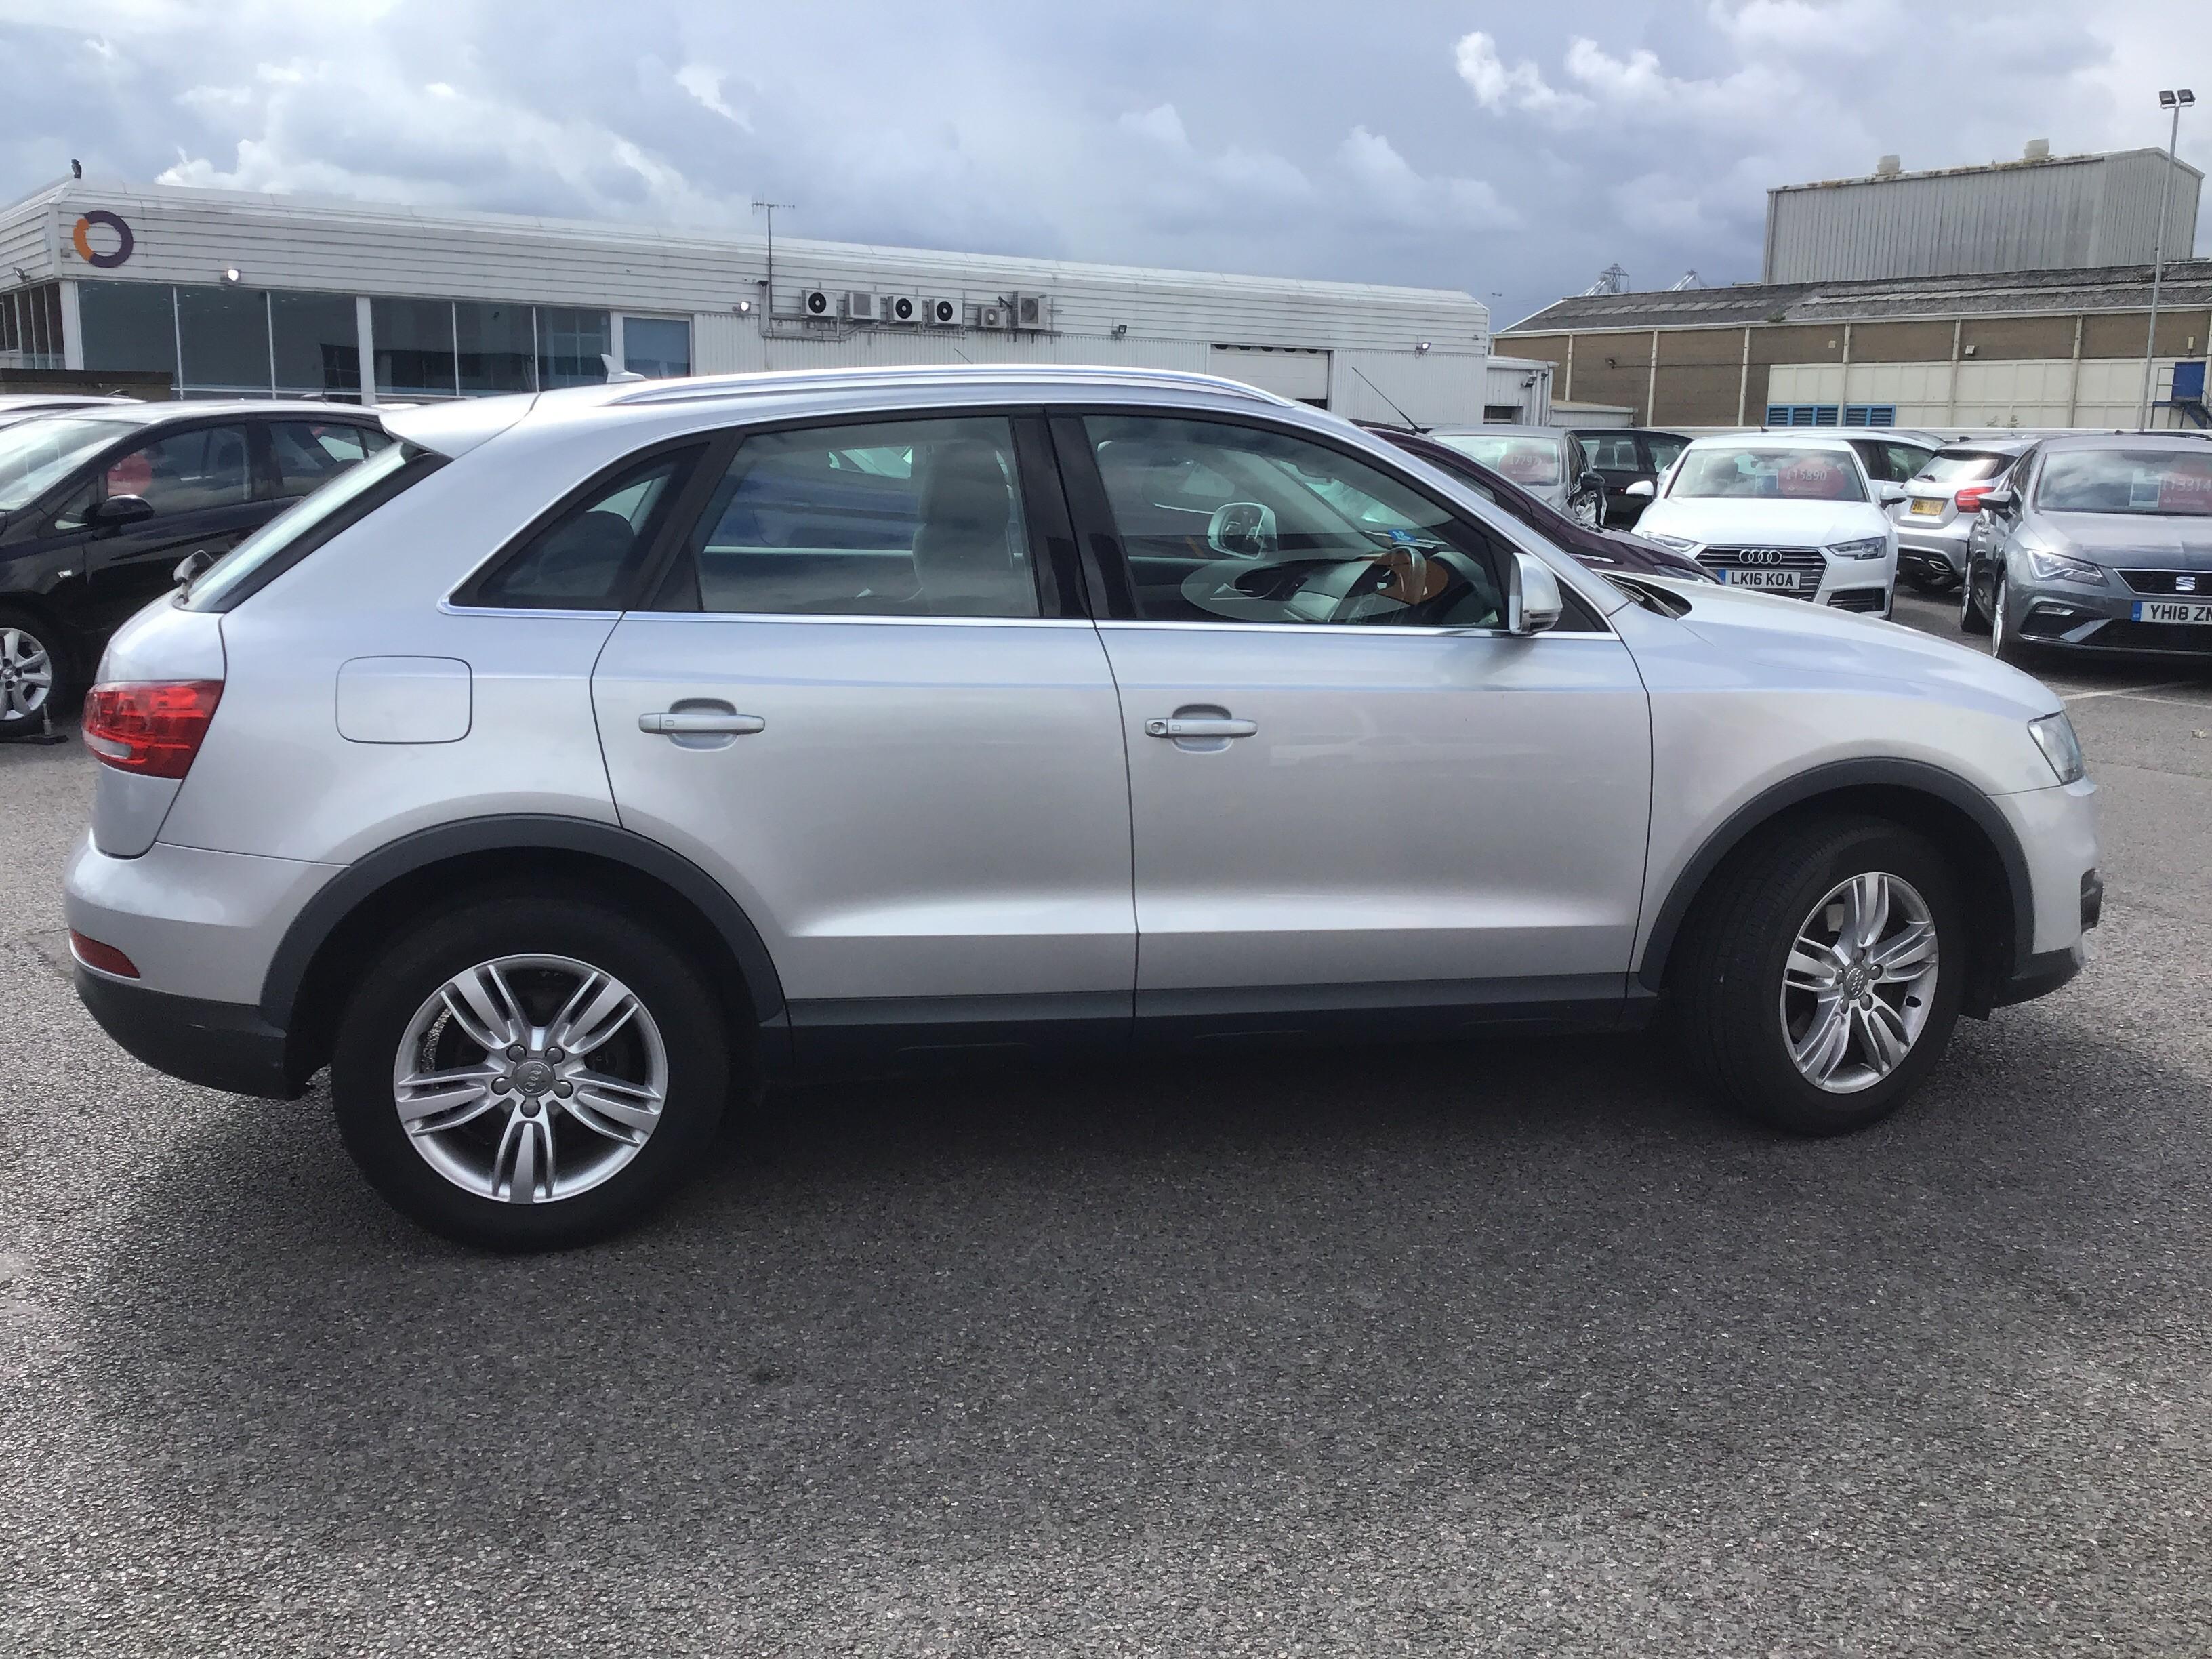 Audi Q3 2.0 TDI SE 5dr Exterior 2